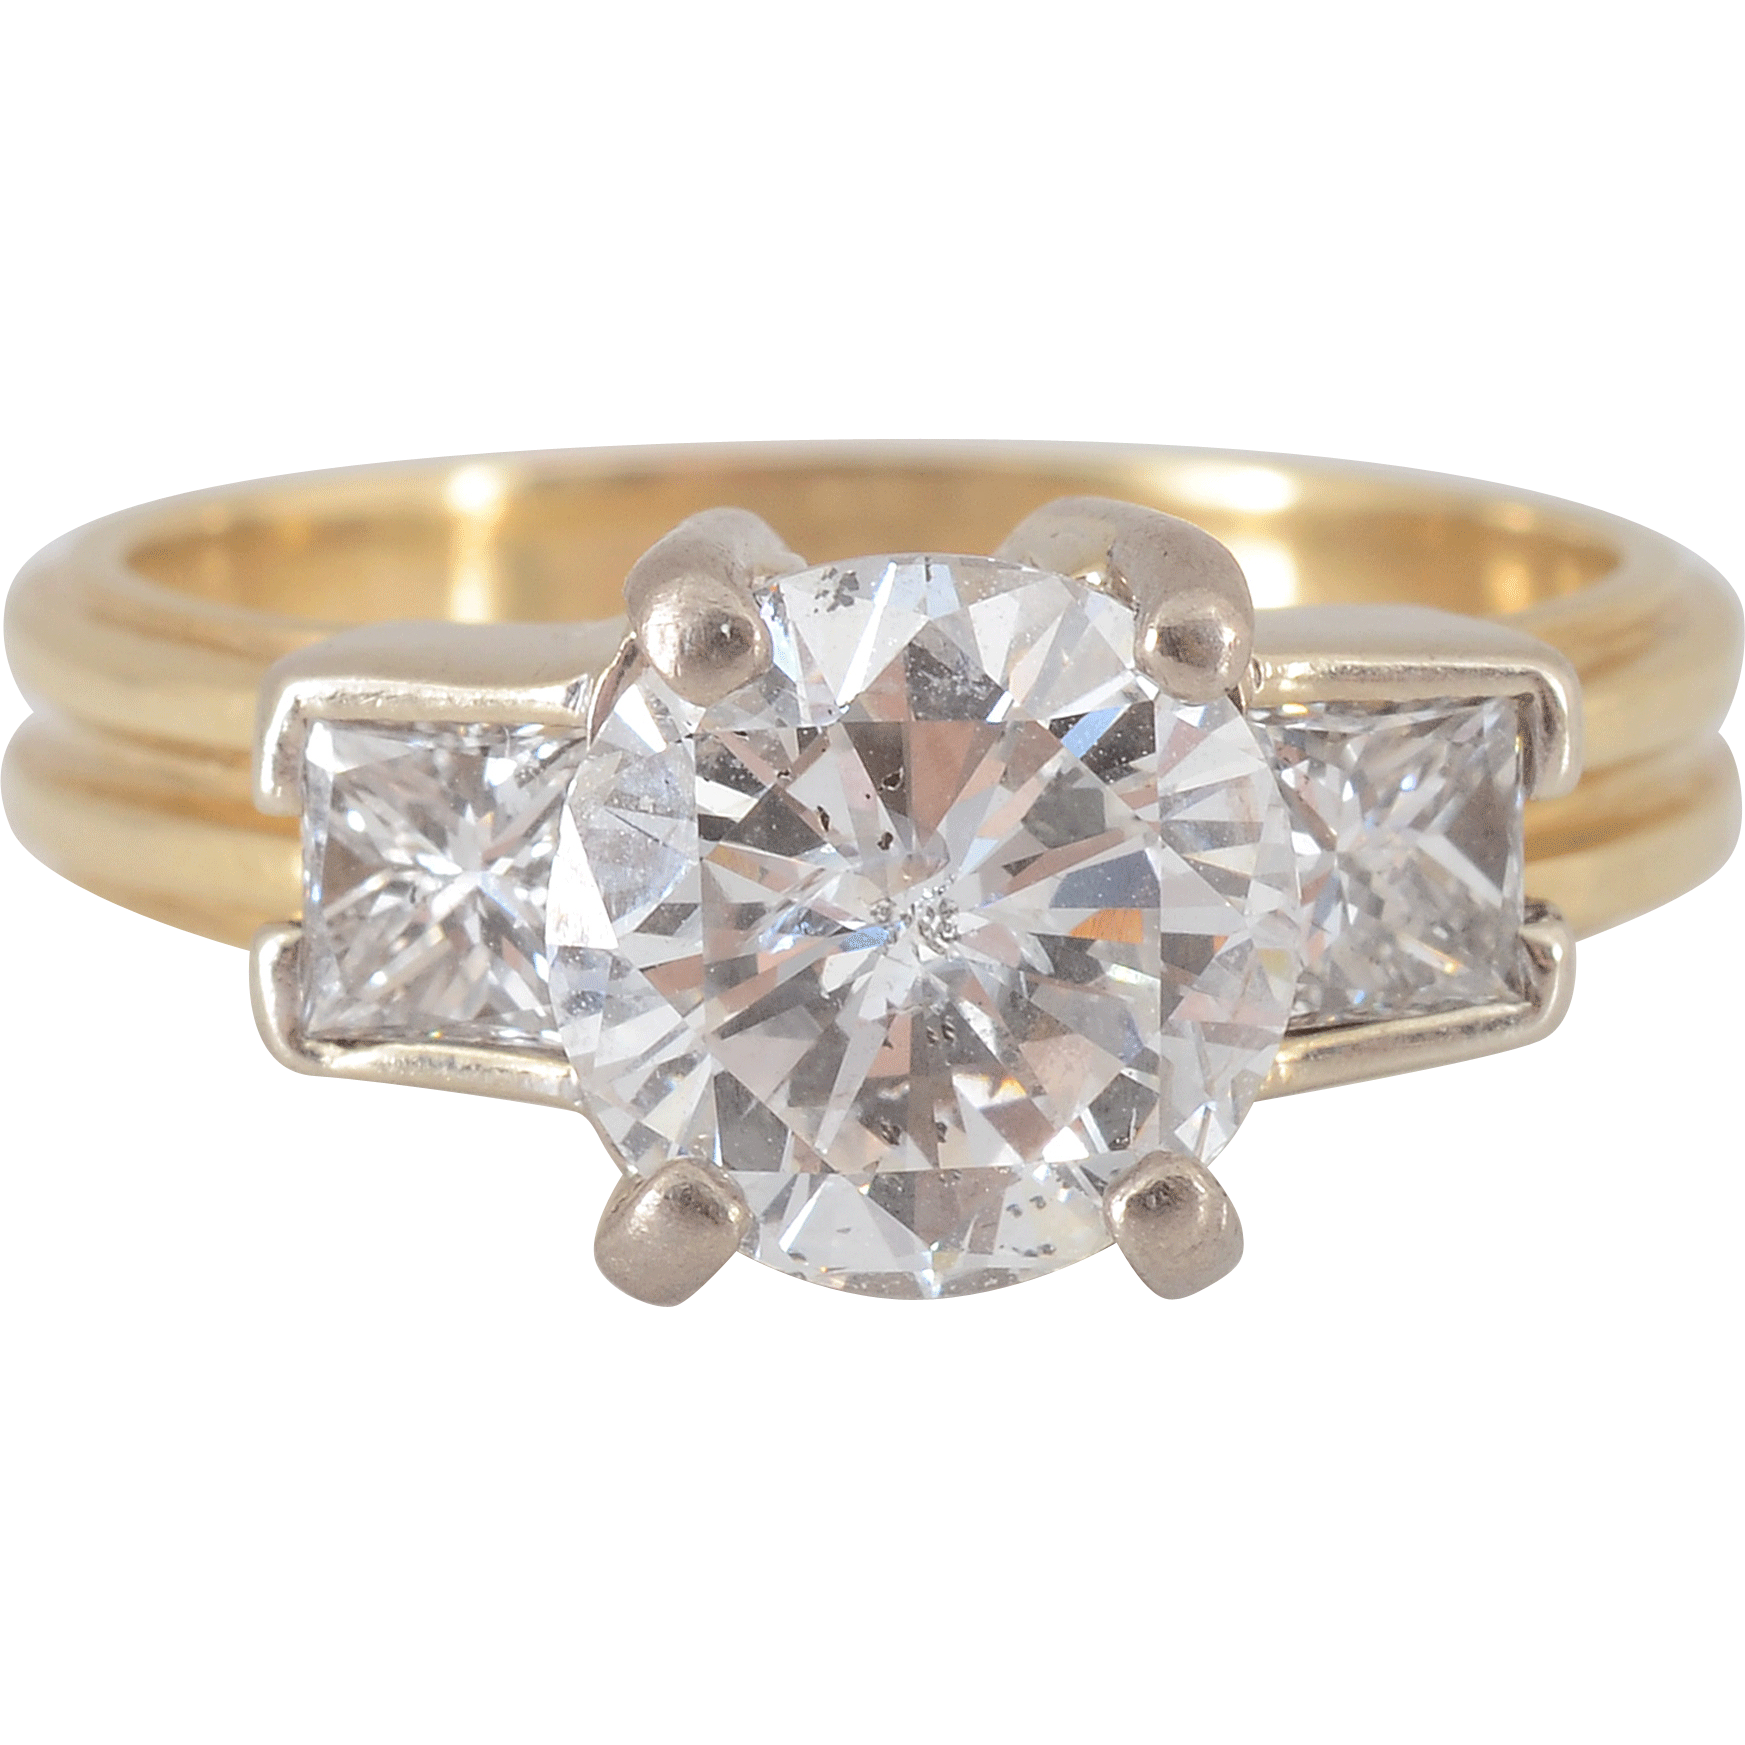 2.04 Carat Center Diamond Engagement Ring